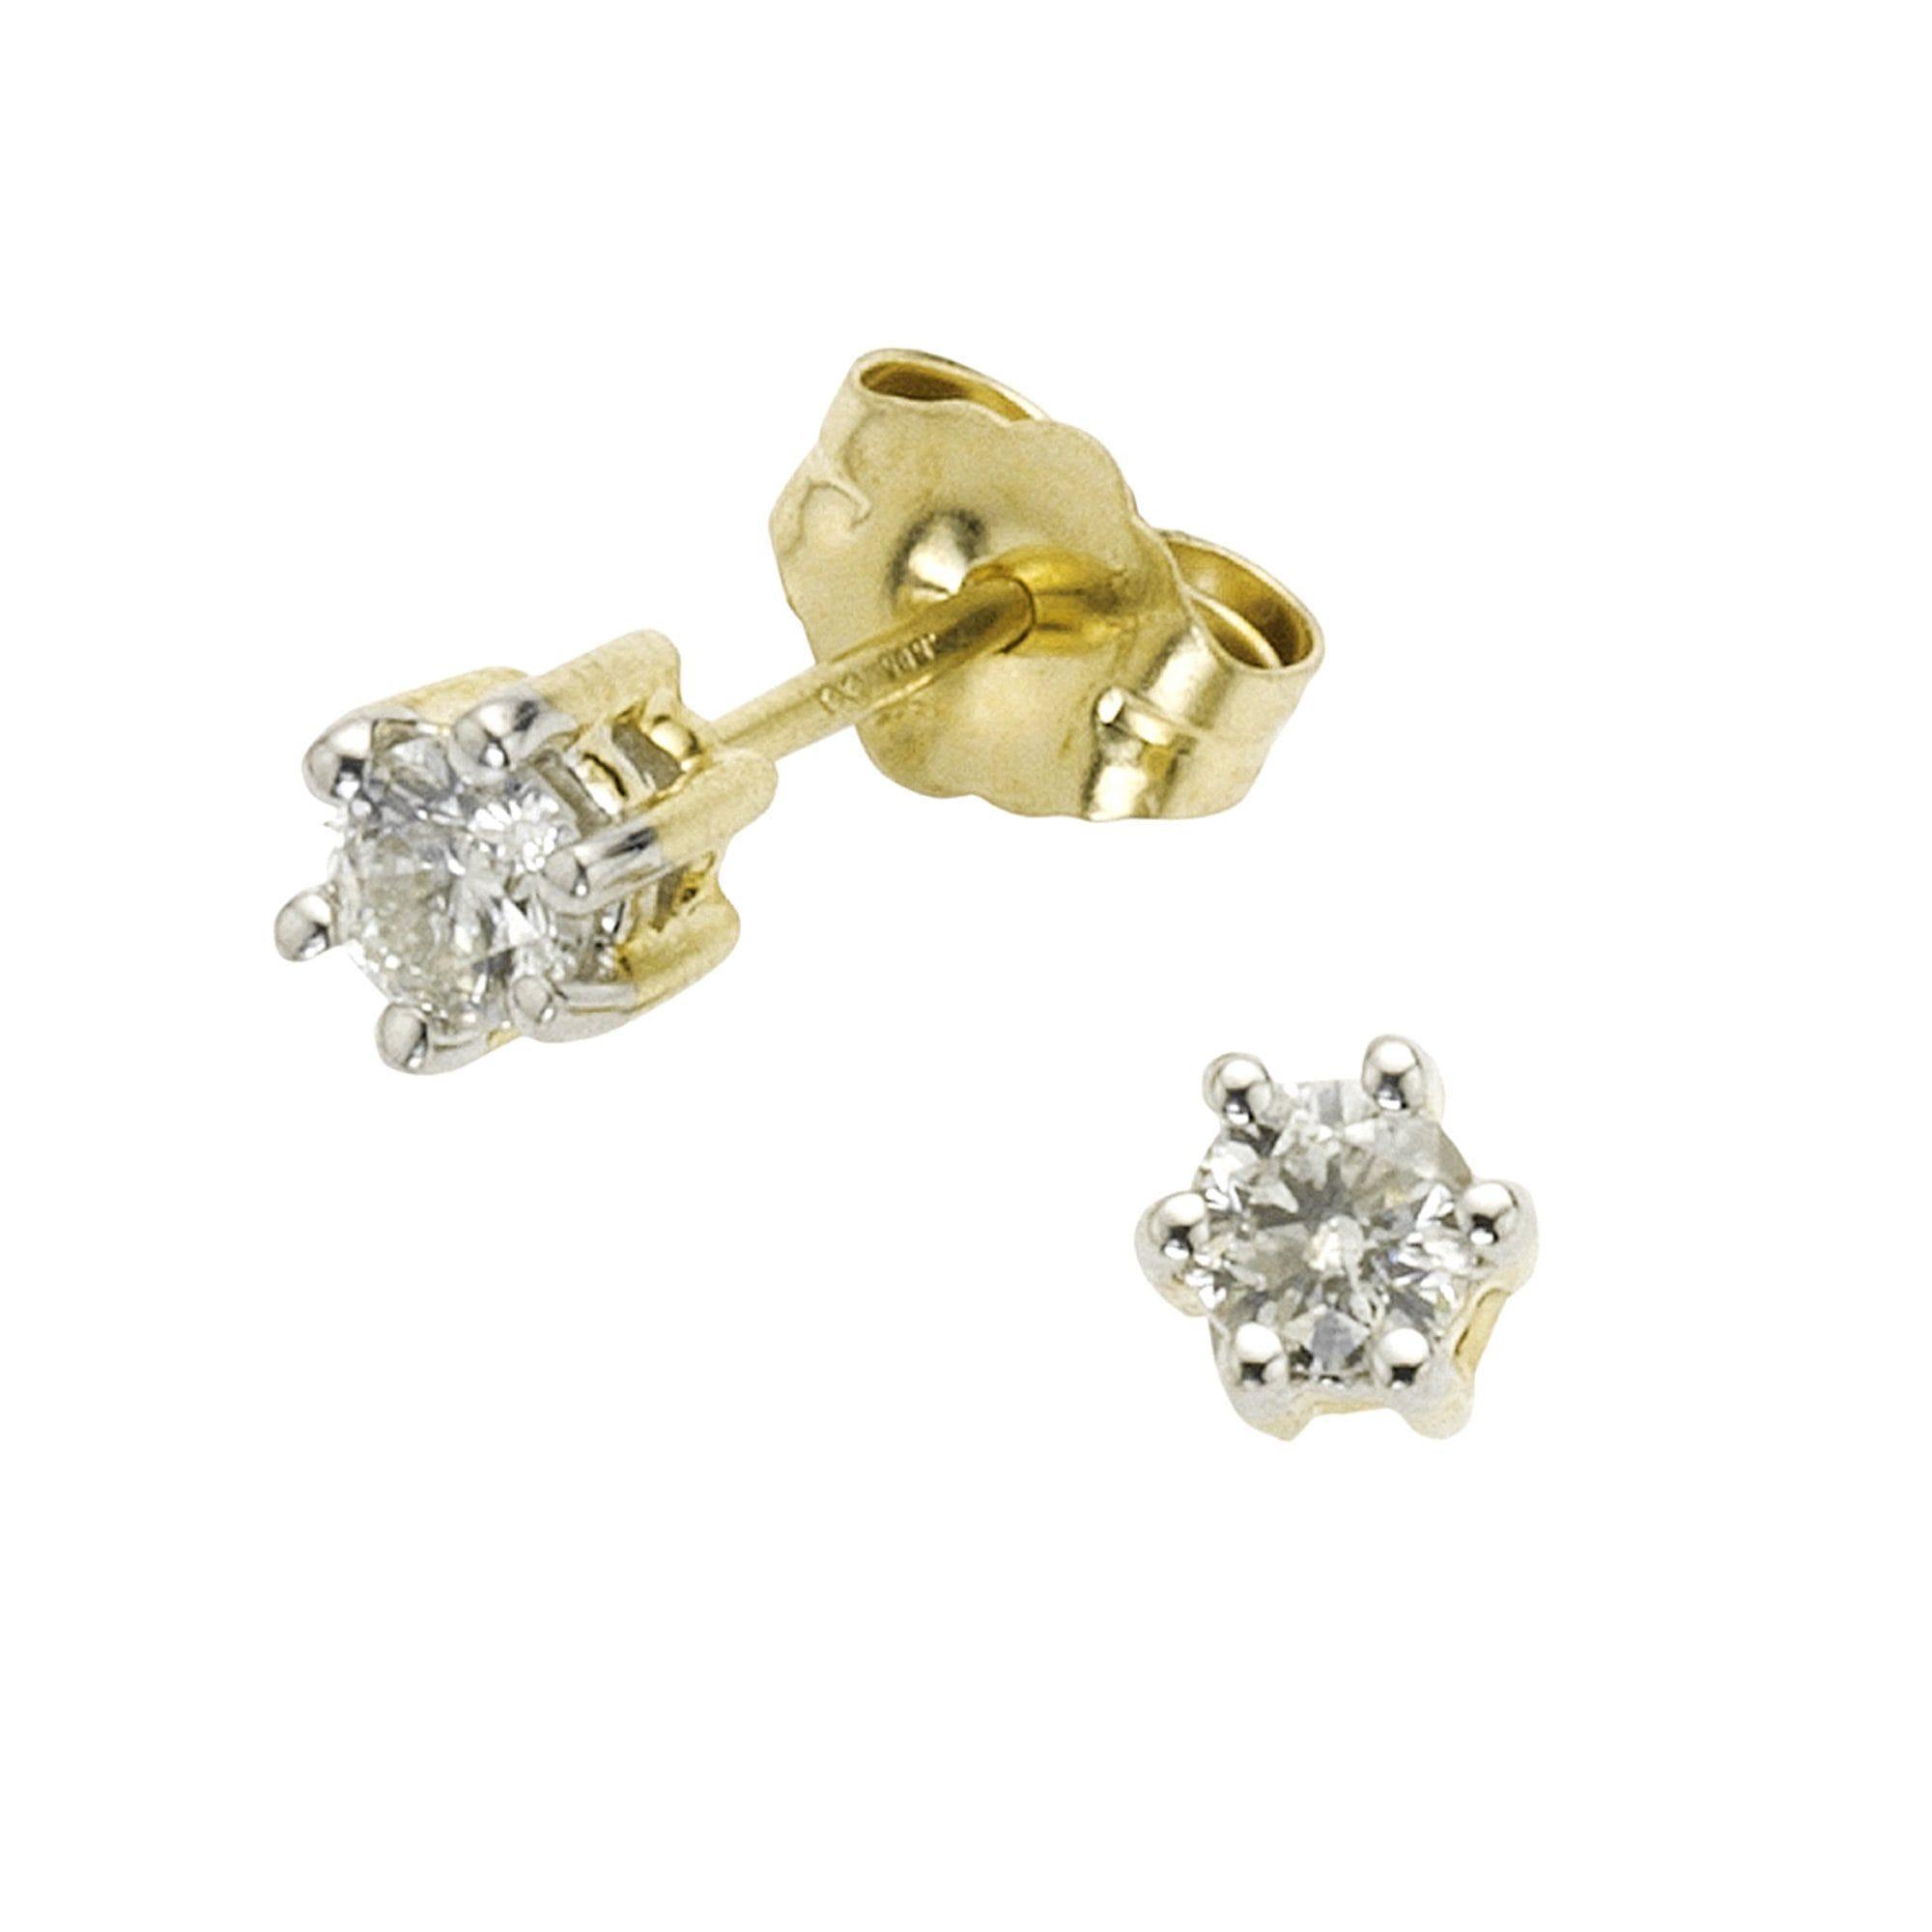 Diamonds by Ellen K Ohrstecker 585/- Gold bicolor Brillant 025ct | Schmuck > Ohrschmuck & Ohrringe > Ohrstecker | Gelb | Diamonds By Ellen K.